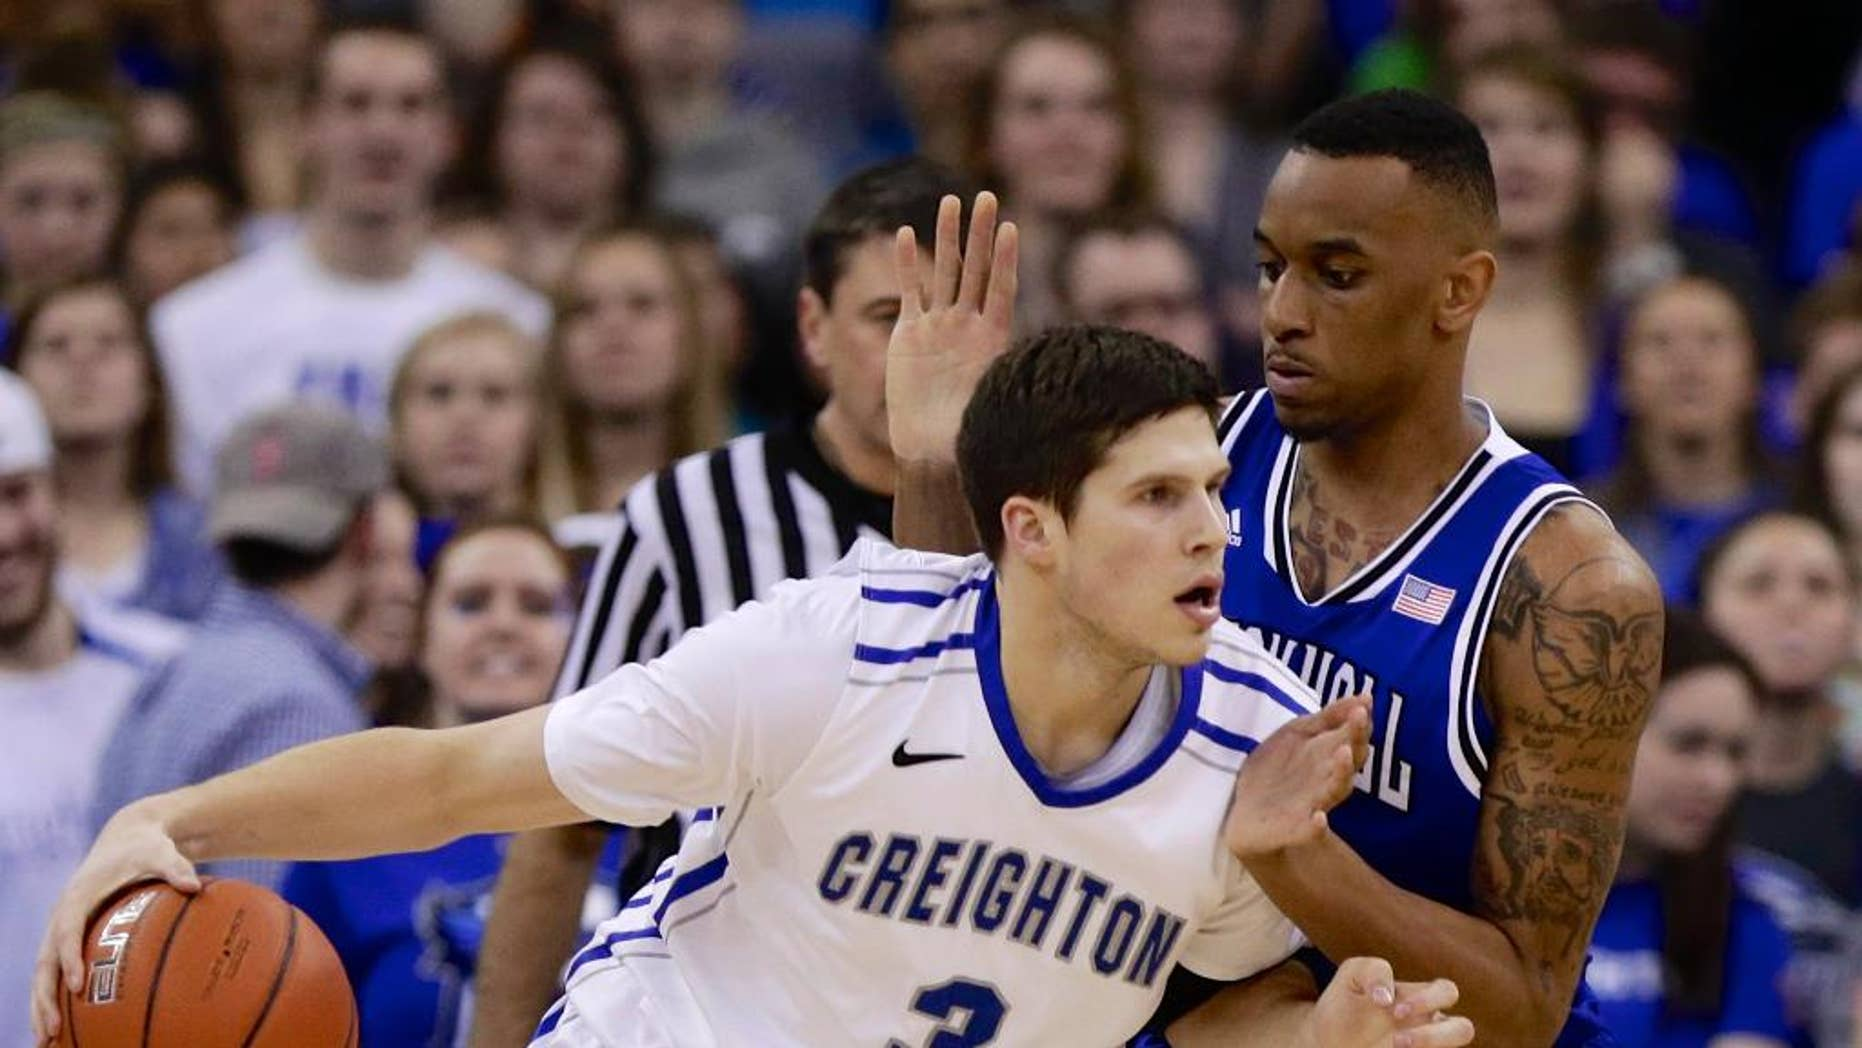 Creighton's Doug McDermott (3) drives around Seton Hall's Brandon Mobley (2) in the first half of an NCAA college basketball game in Omaha, Neb., Sunday, Feb. 23, 2014. (AP Photo/Nati Harnik)